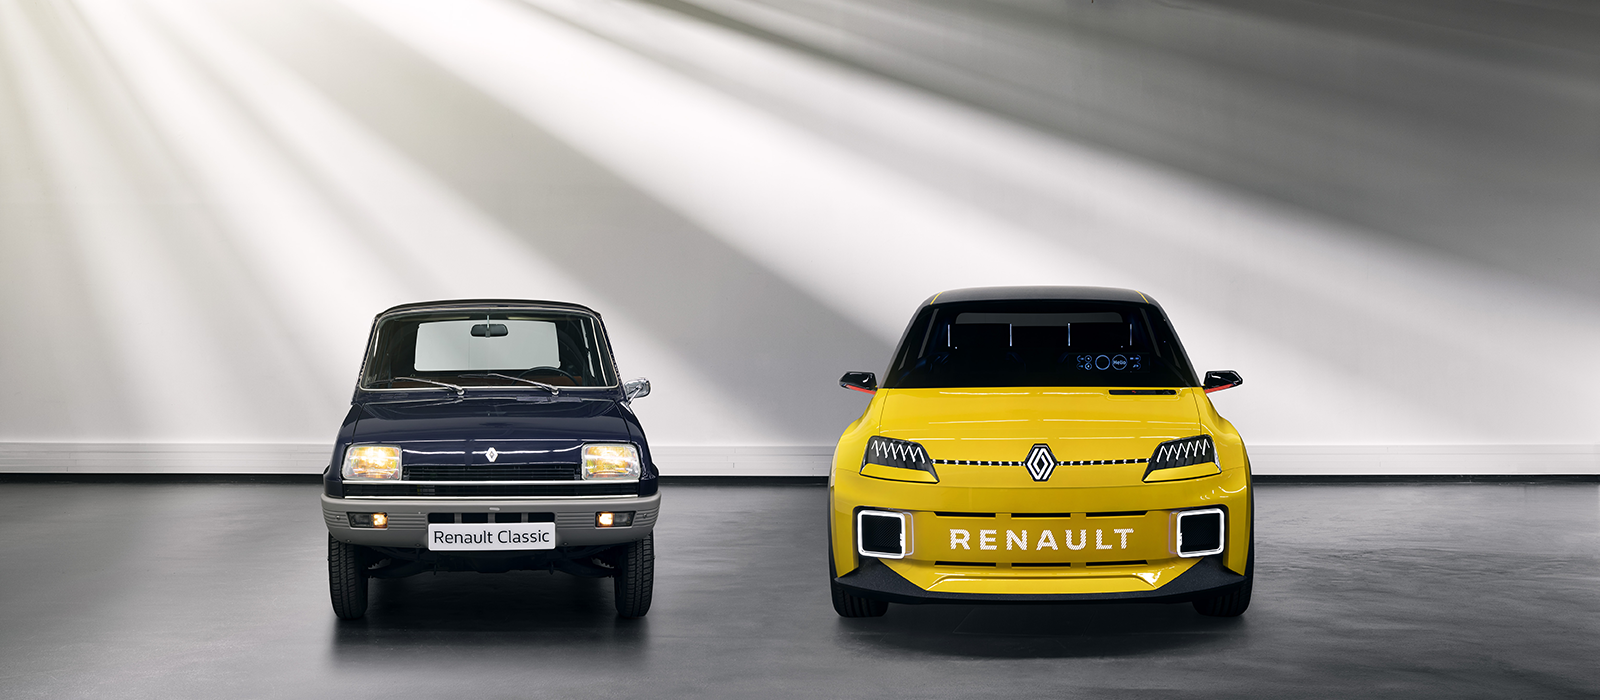 The original Renault R5 and its descendant